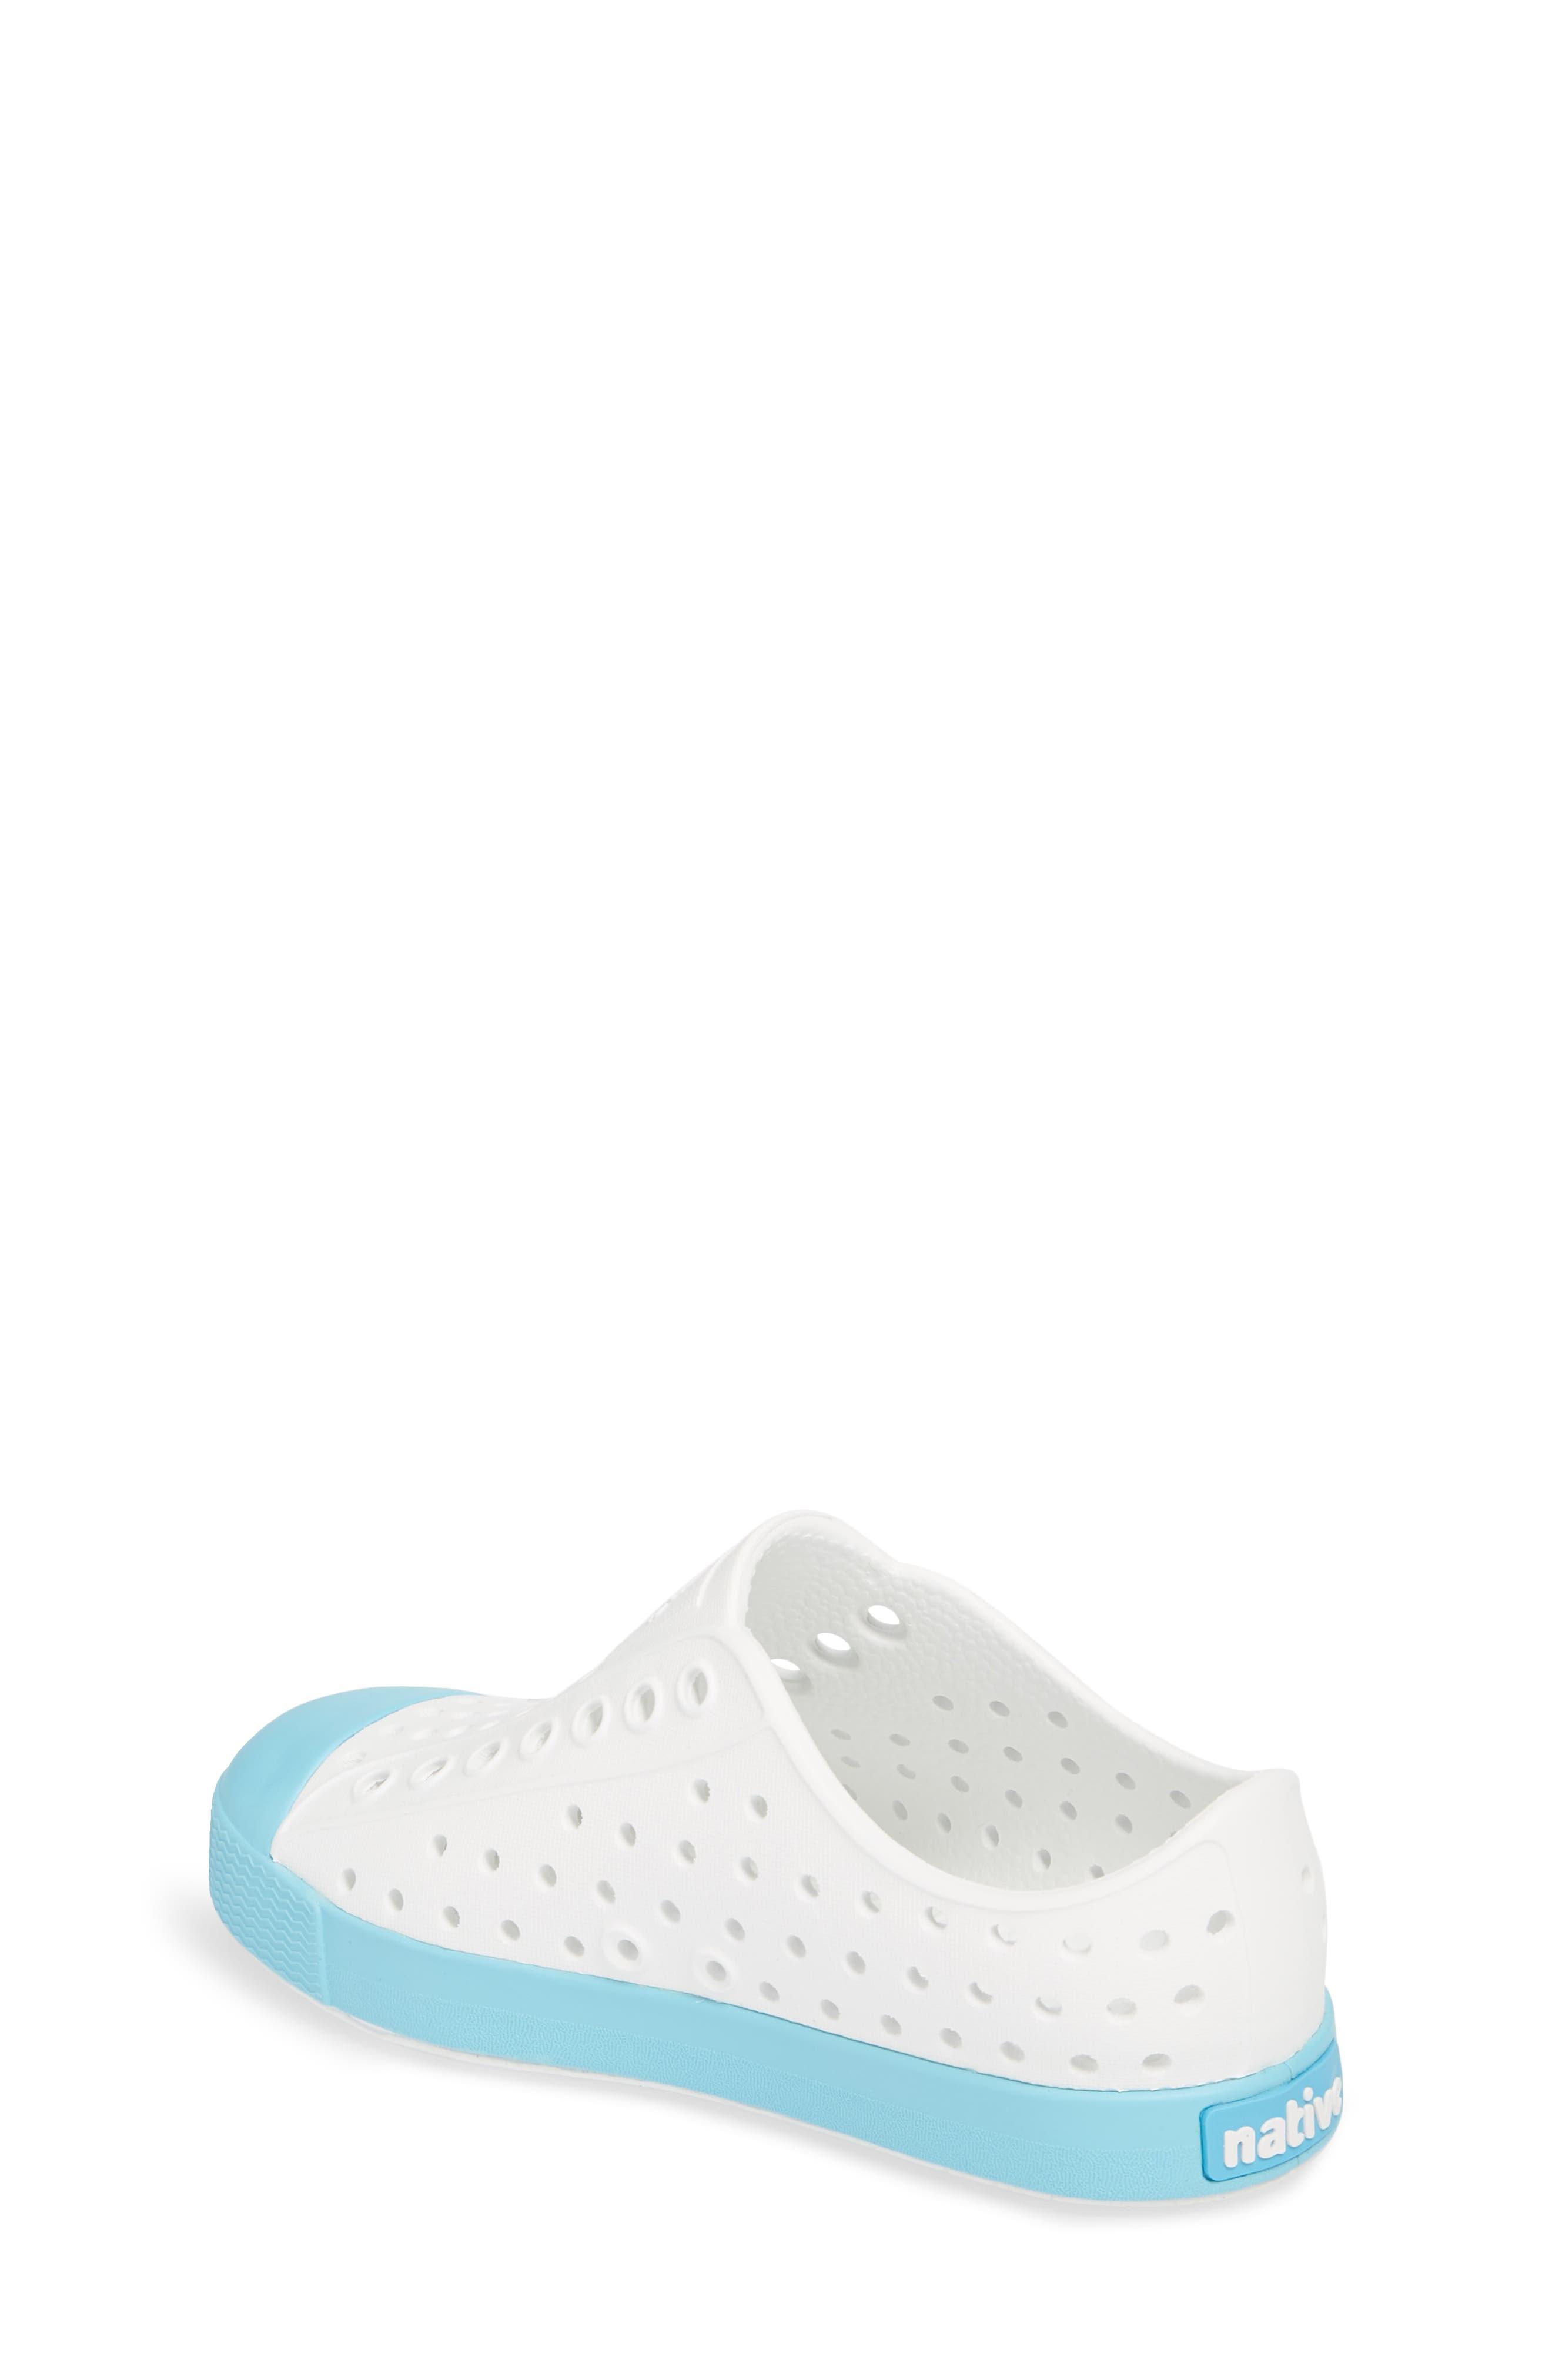 'Jefferson' Water Friendly Slip-On Sneaker,                             Alternate thumbnail 73, color,